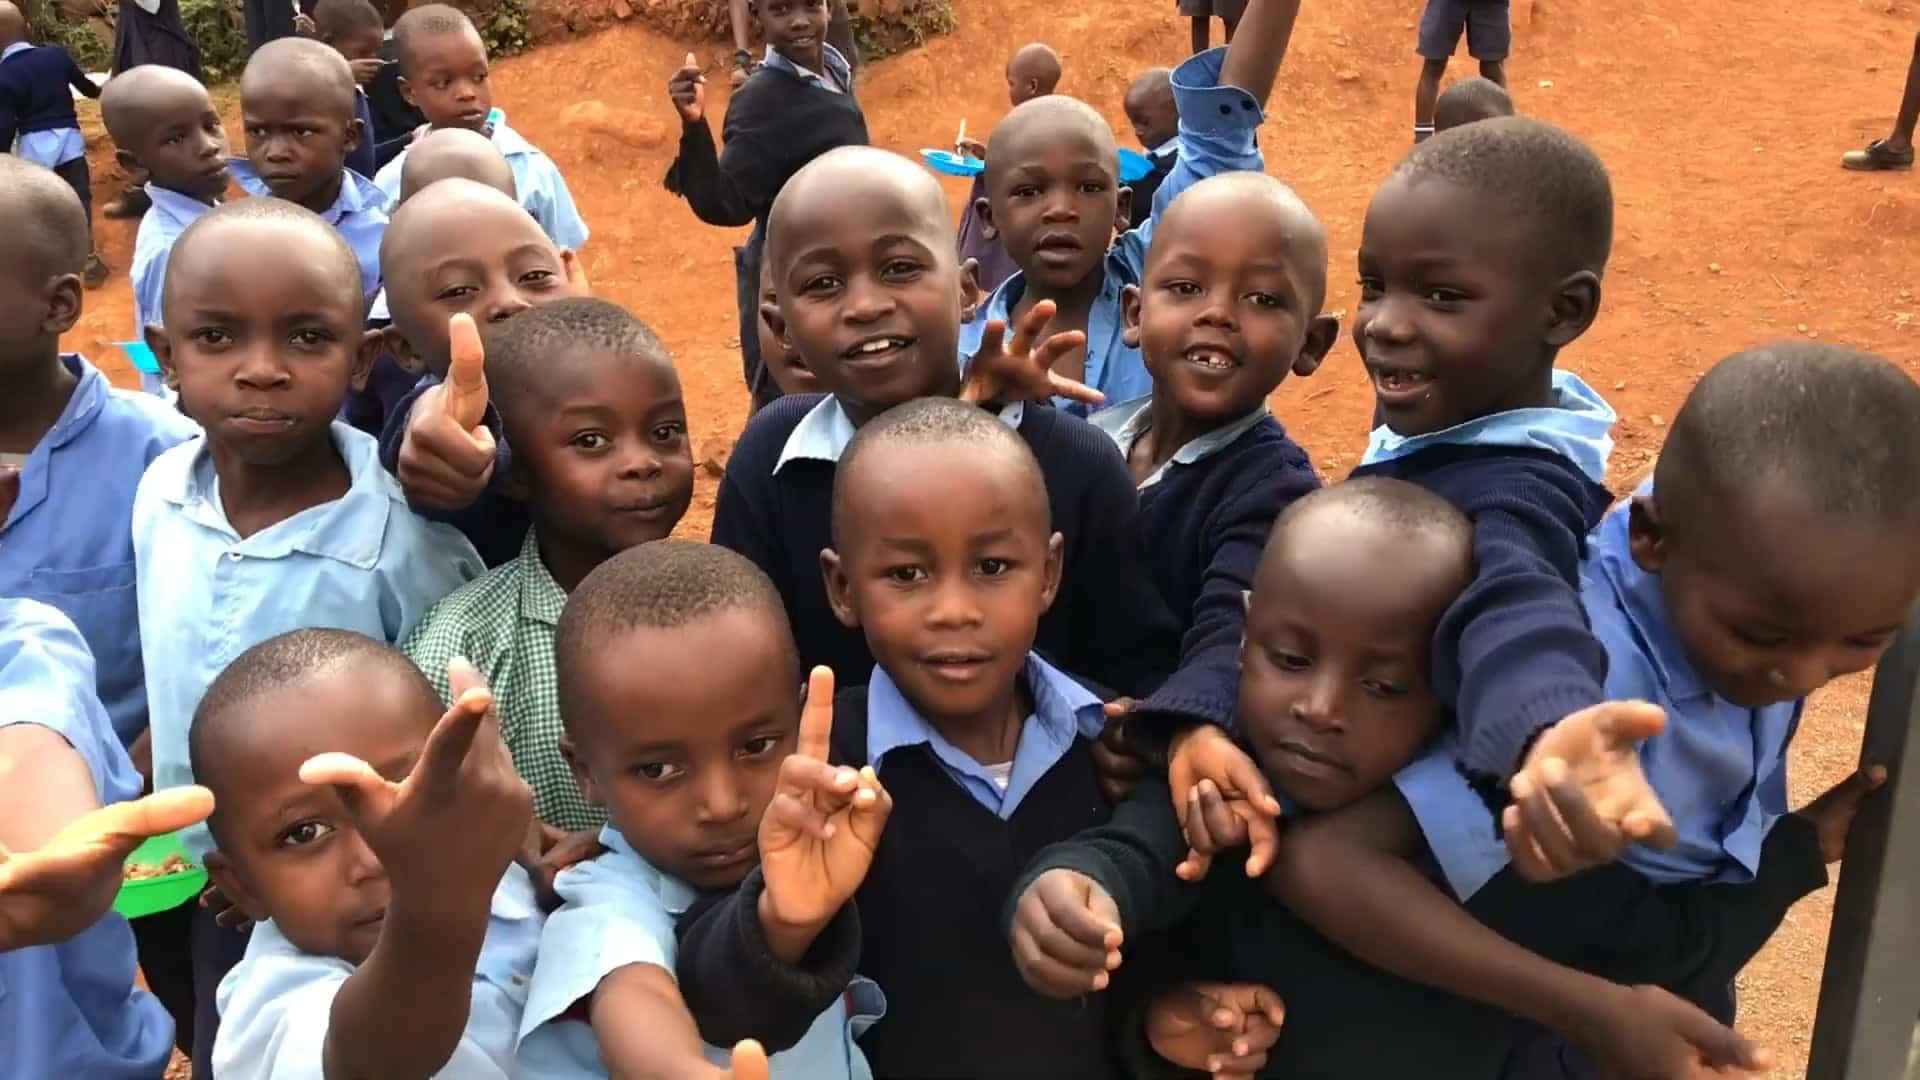 Weimar Academy Mission Trip | Kenya 2019